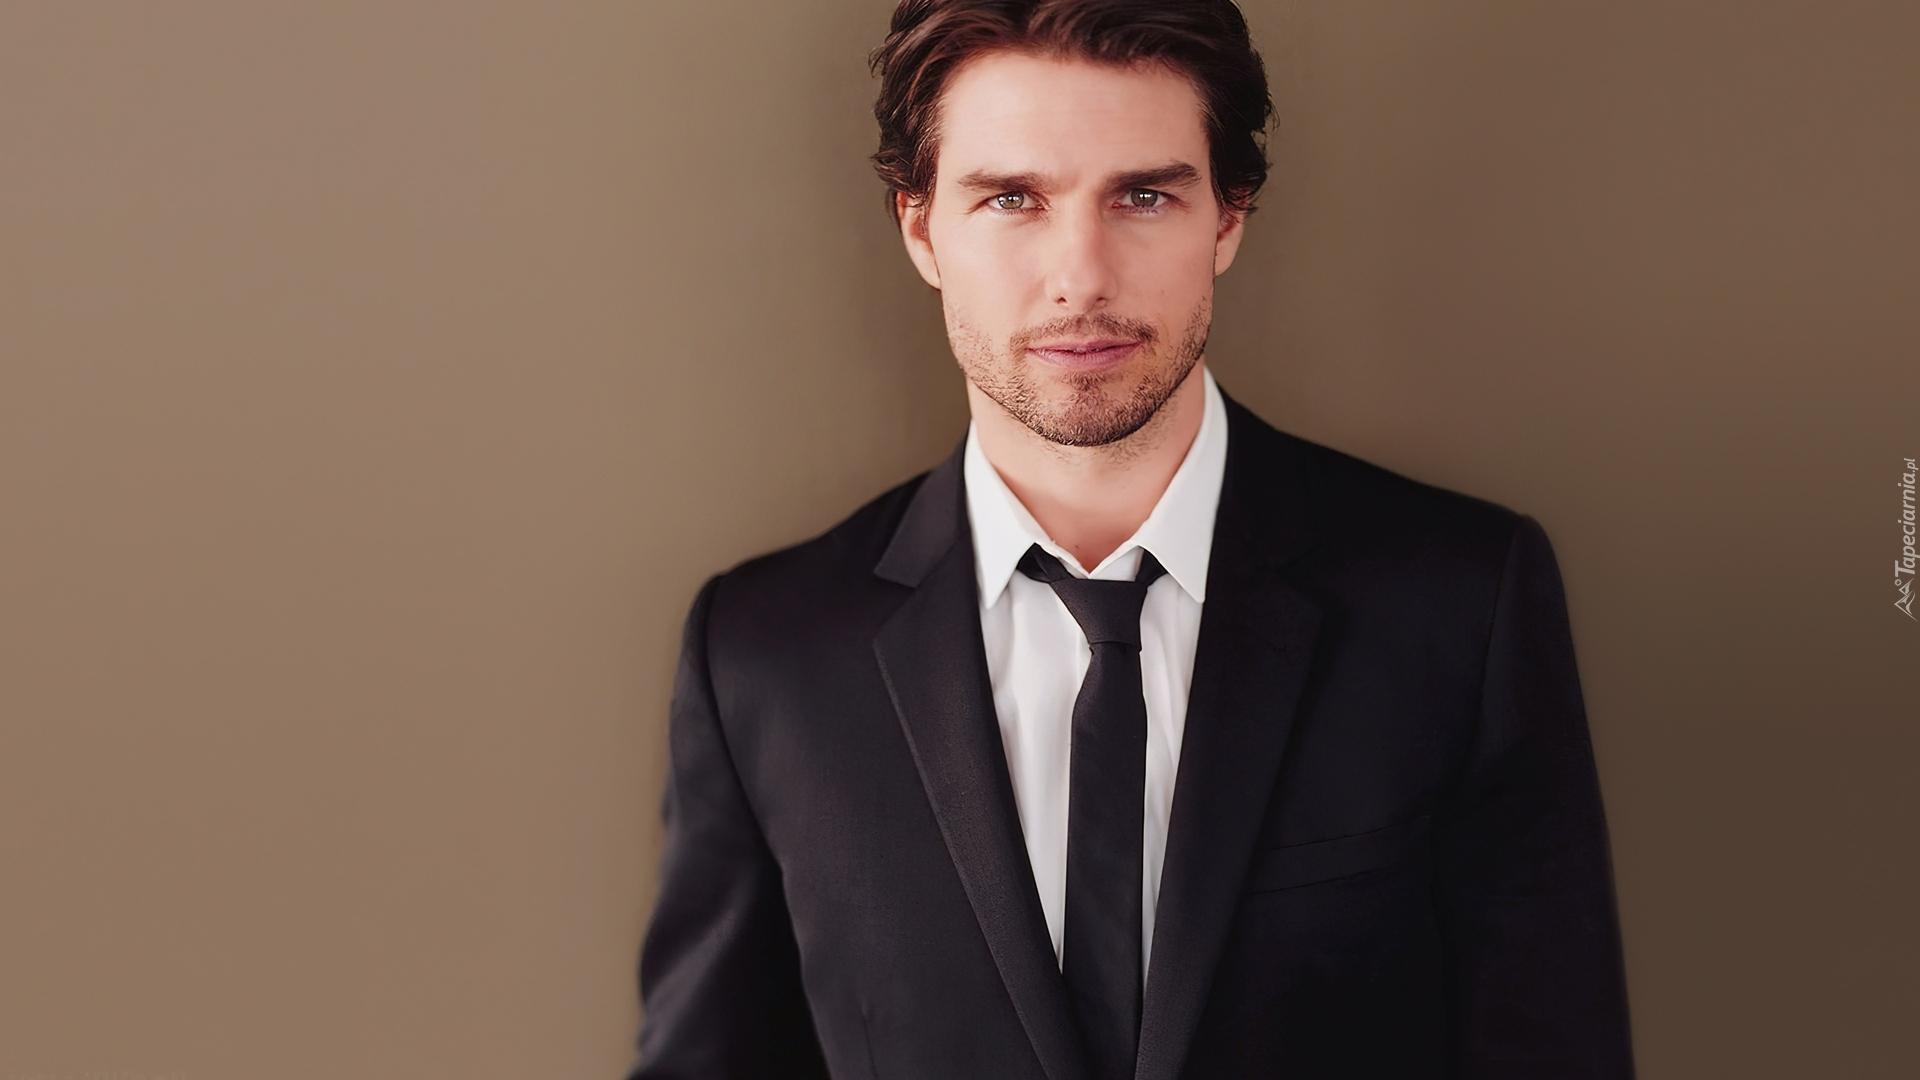 Tom Cruise, Aktor, Zarost, Krawat